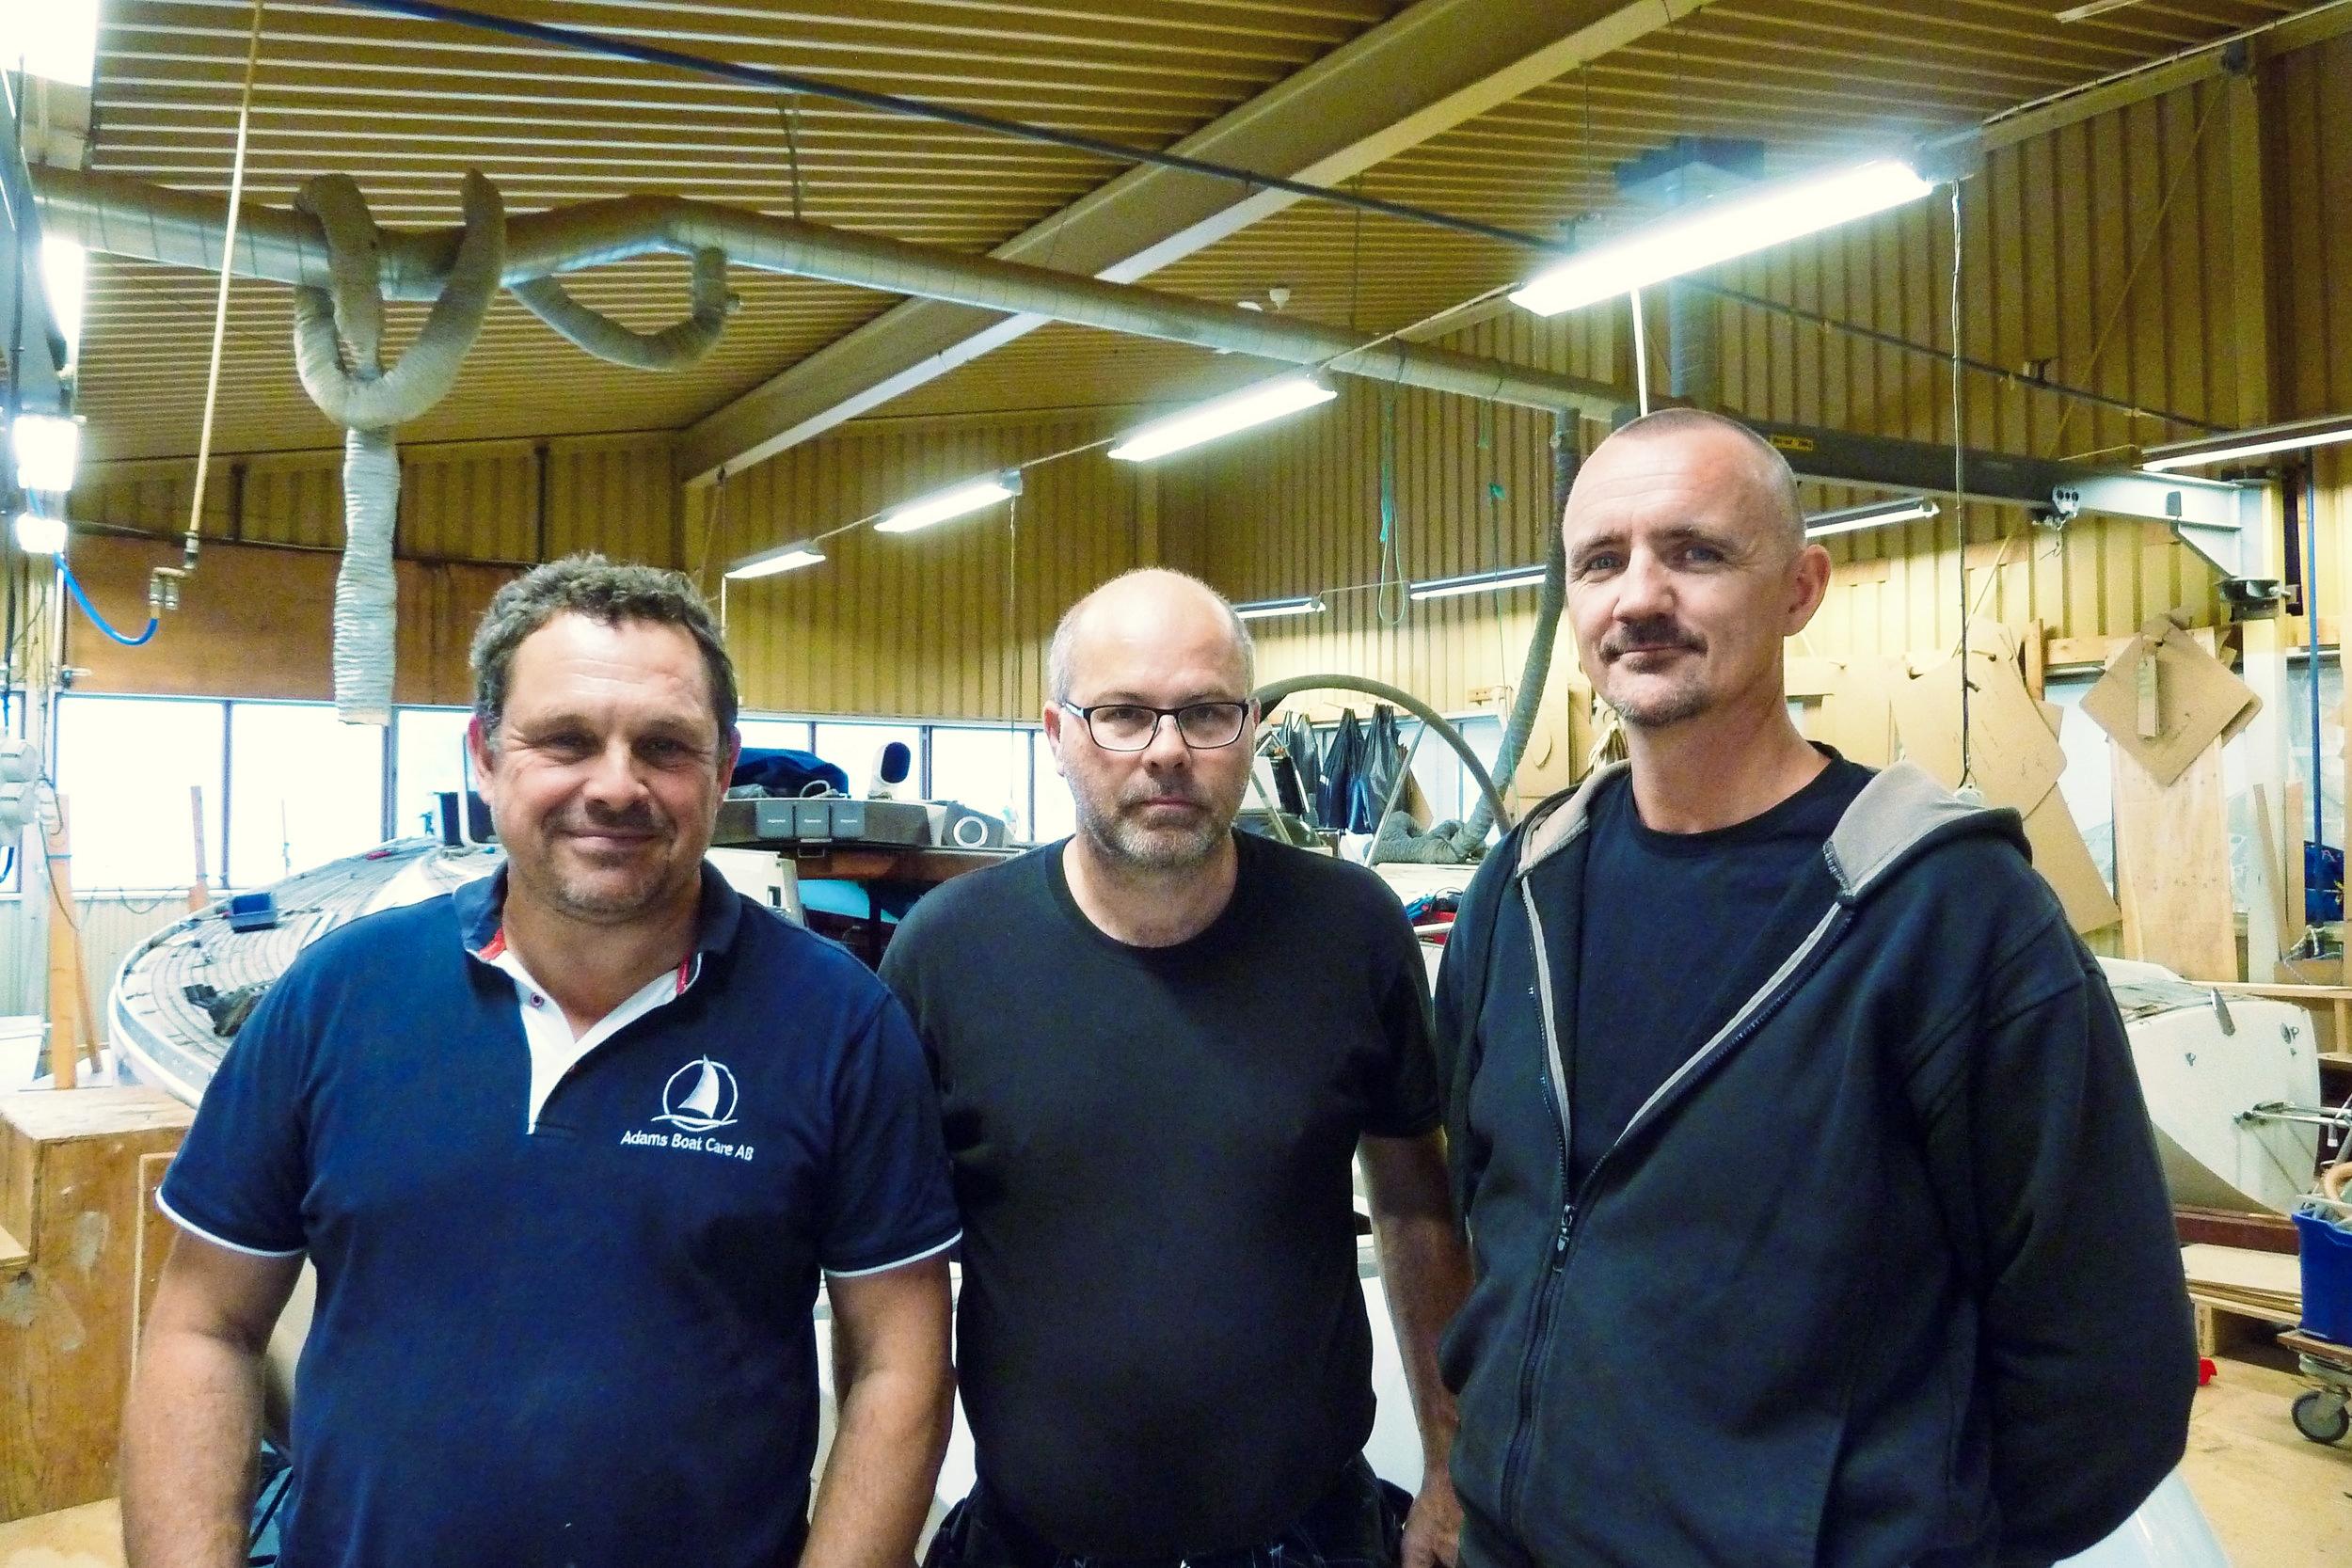 From the left; Owner Carl Adams, Chief Engineer Christer Verta and Master Teak Layer Kjetil Overvik. Photo: Daniel Novello